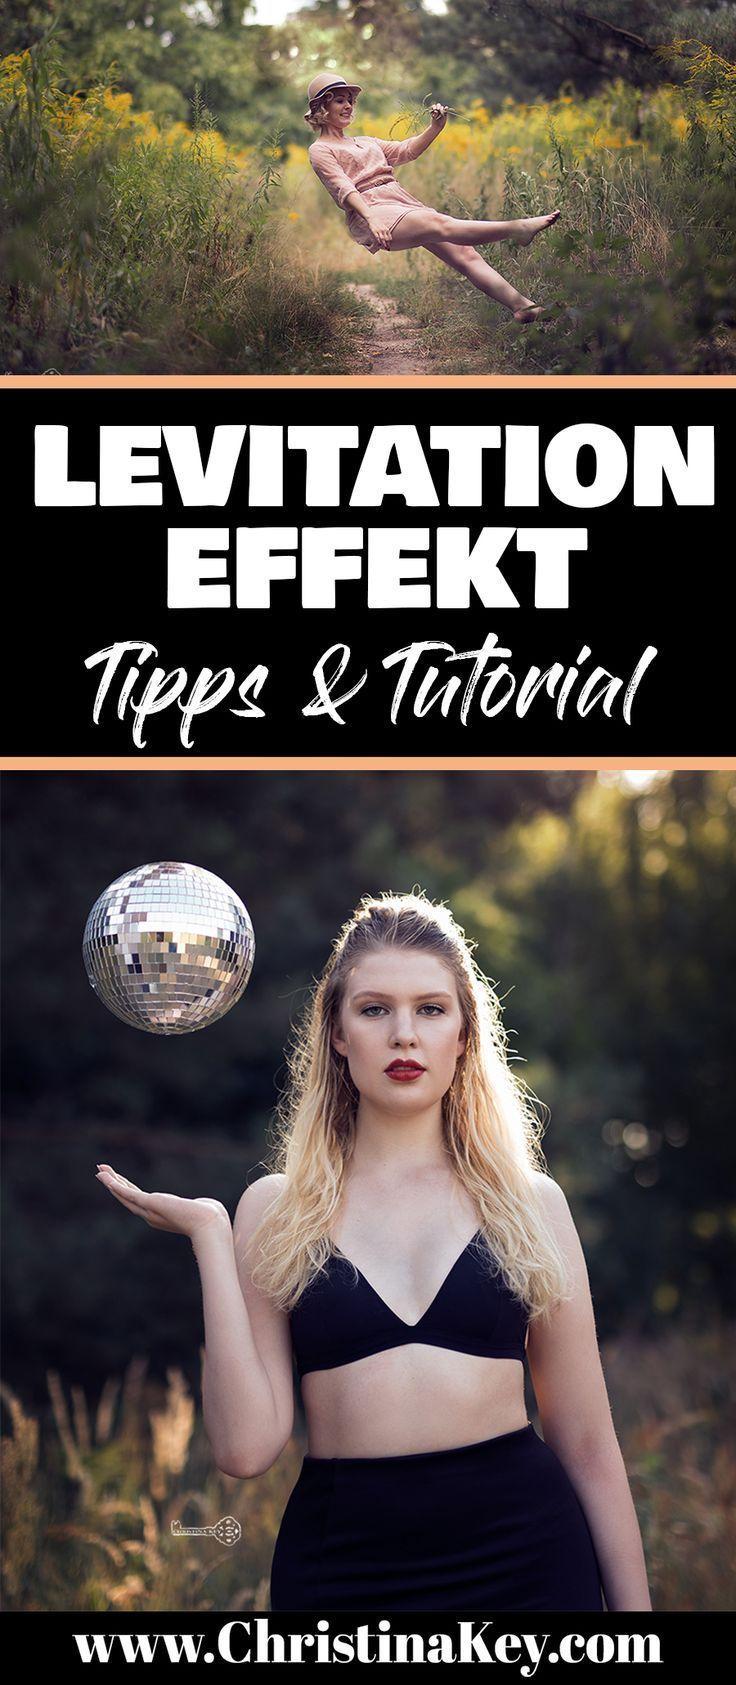 Levitation Fotografie Tipps